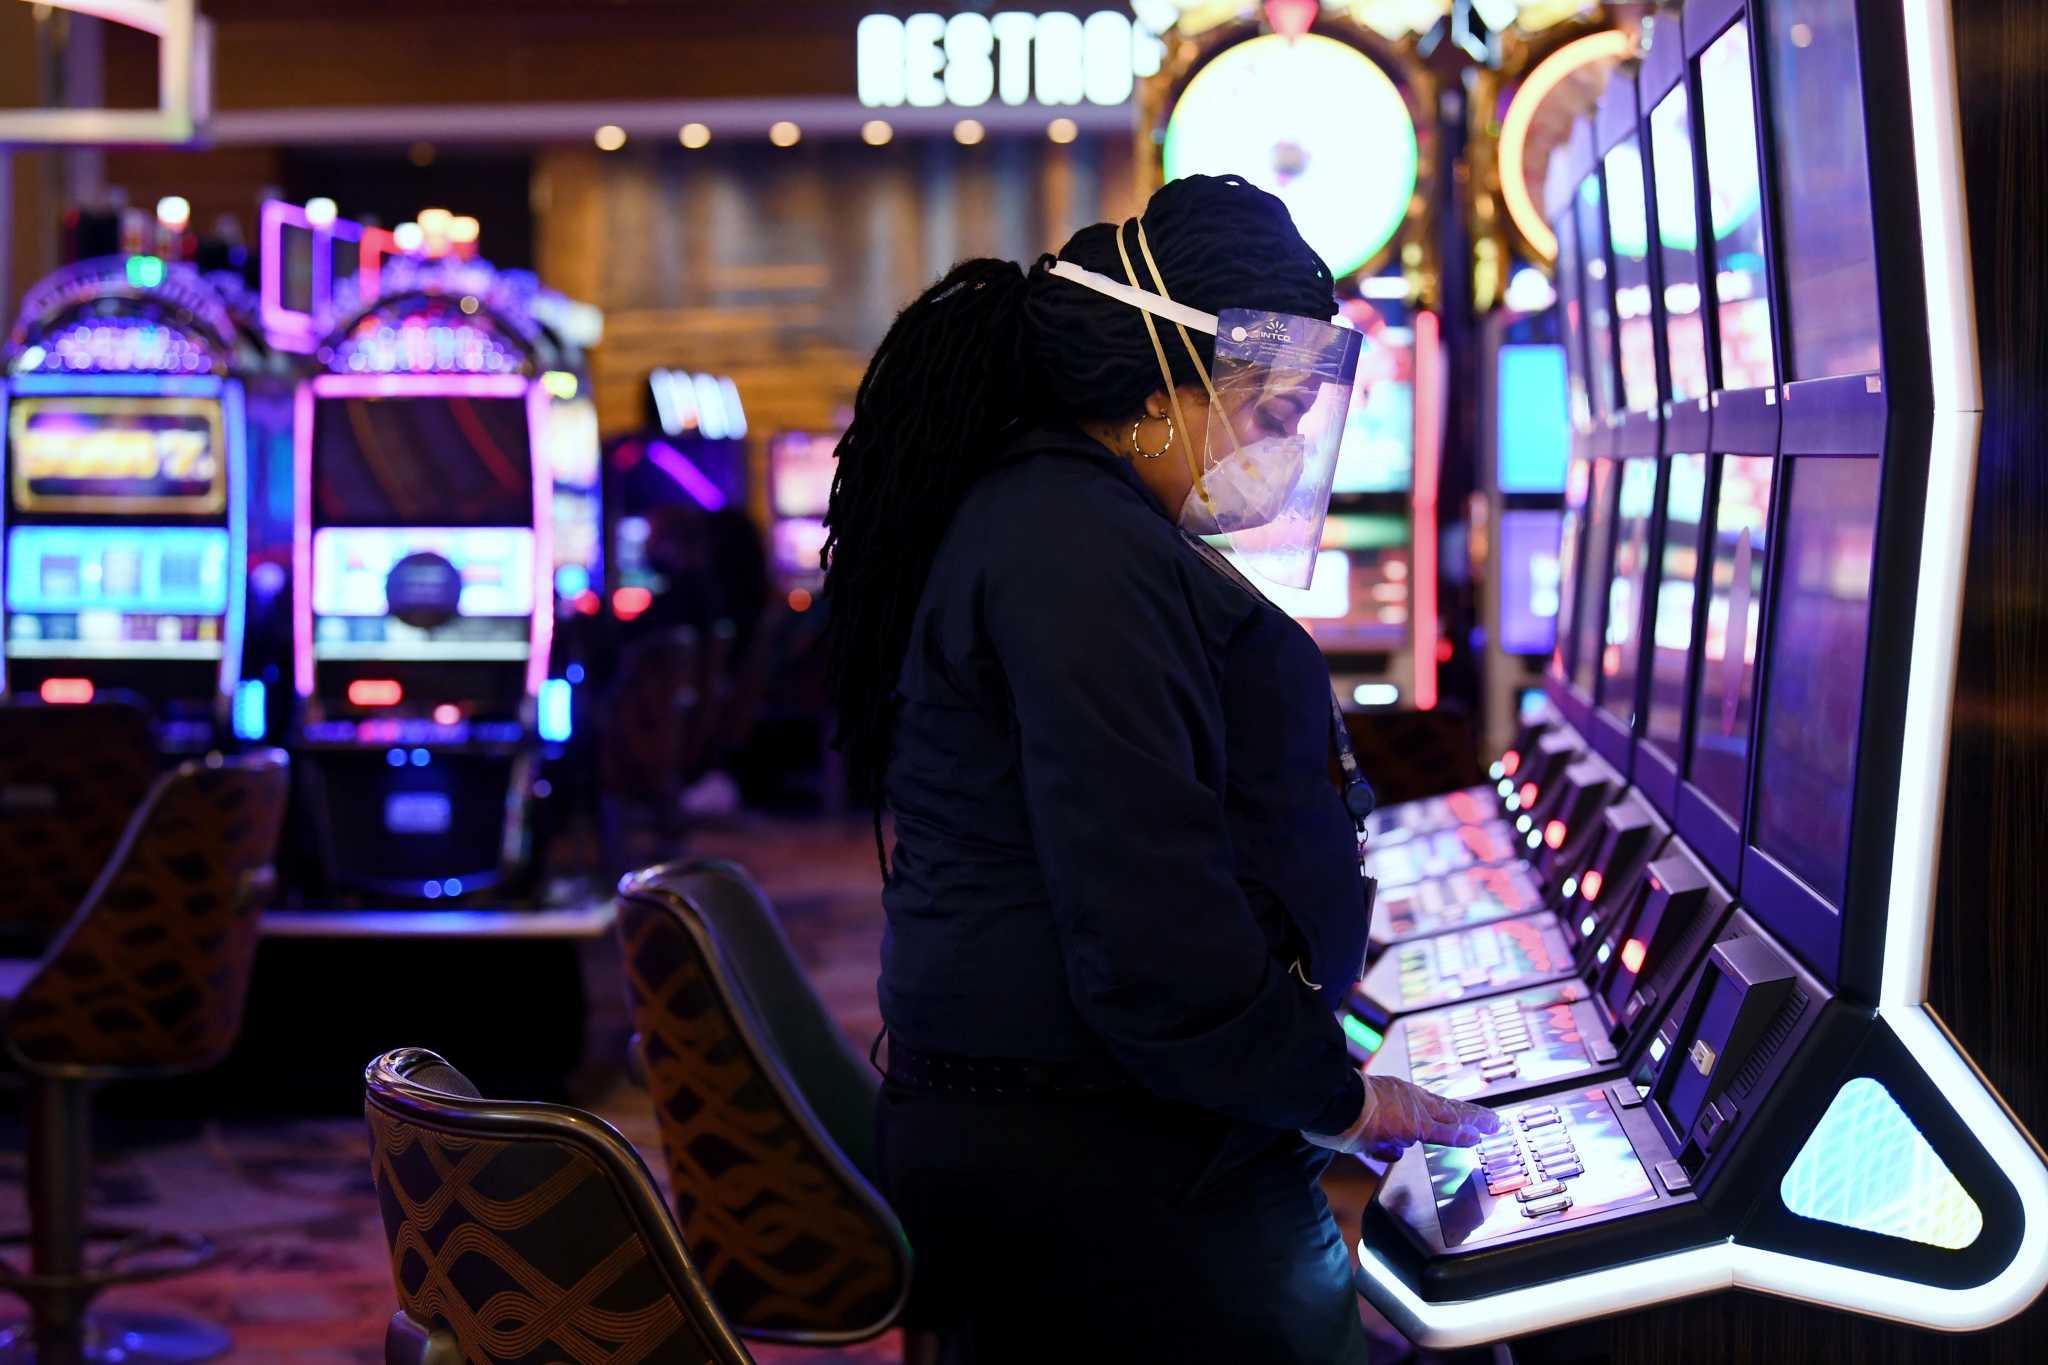 Kasino Maryland dibuka kembali - ExpressNews.com